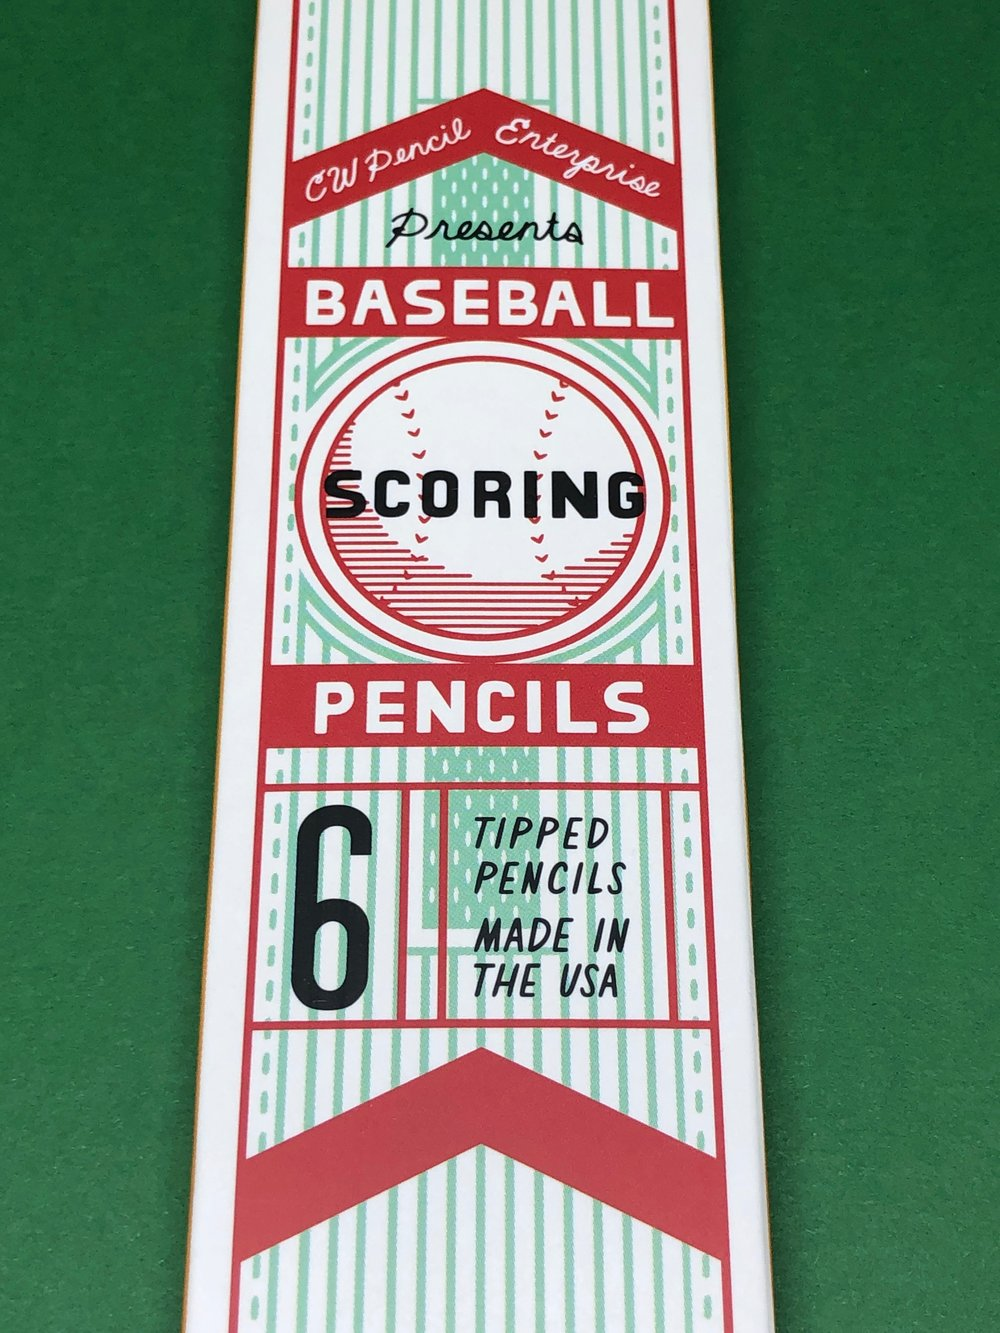 cwpe-generals-baseball-scoring-pencil-6.jpg